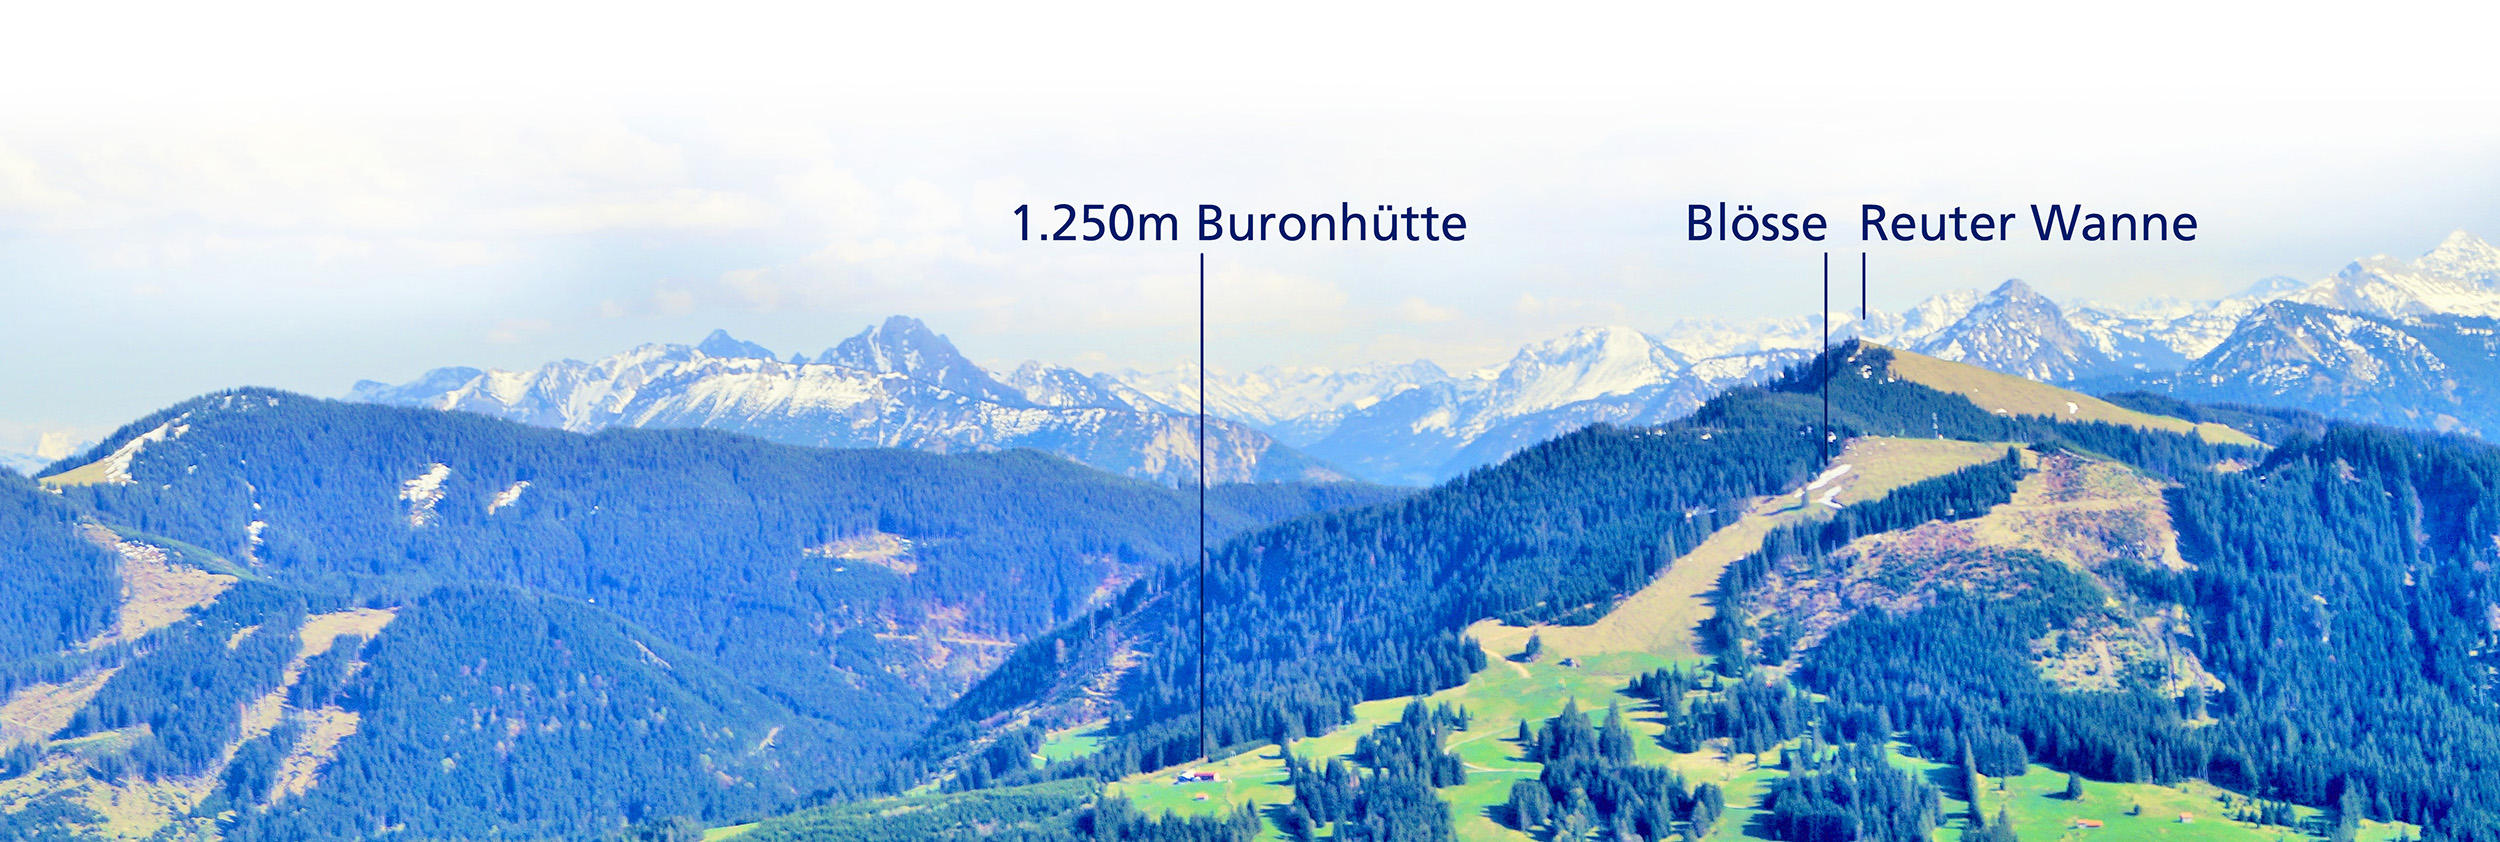 Home Buronhutte